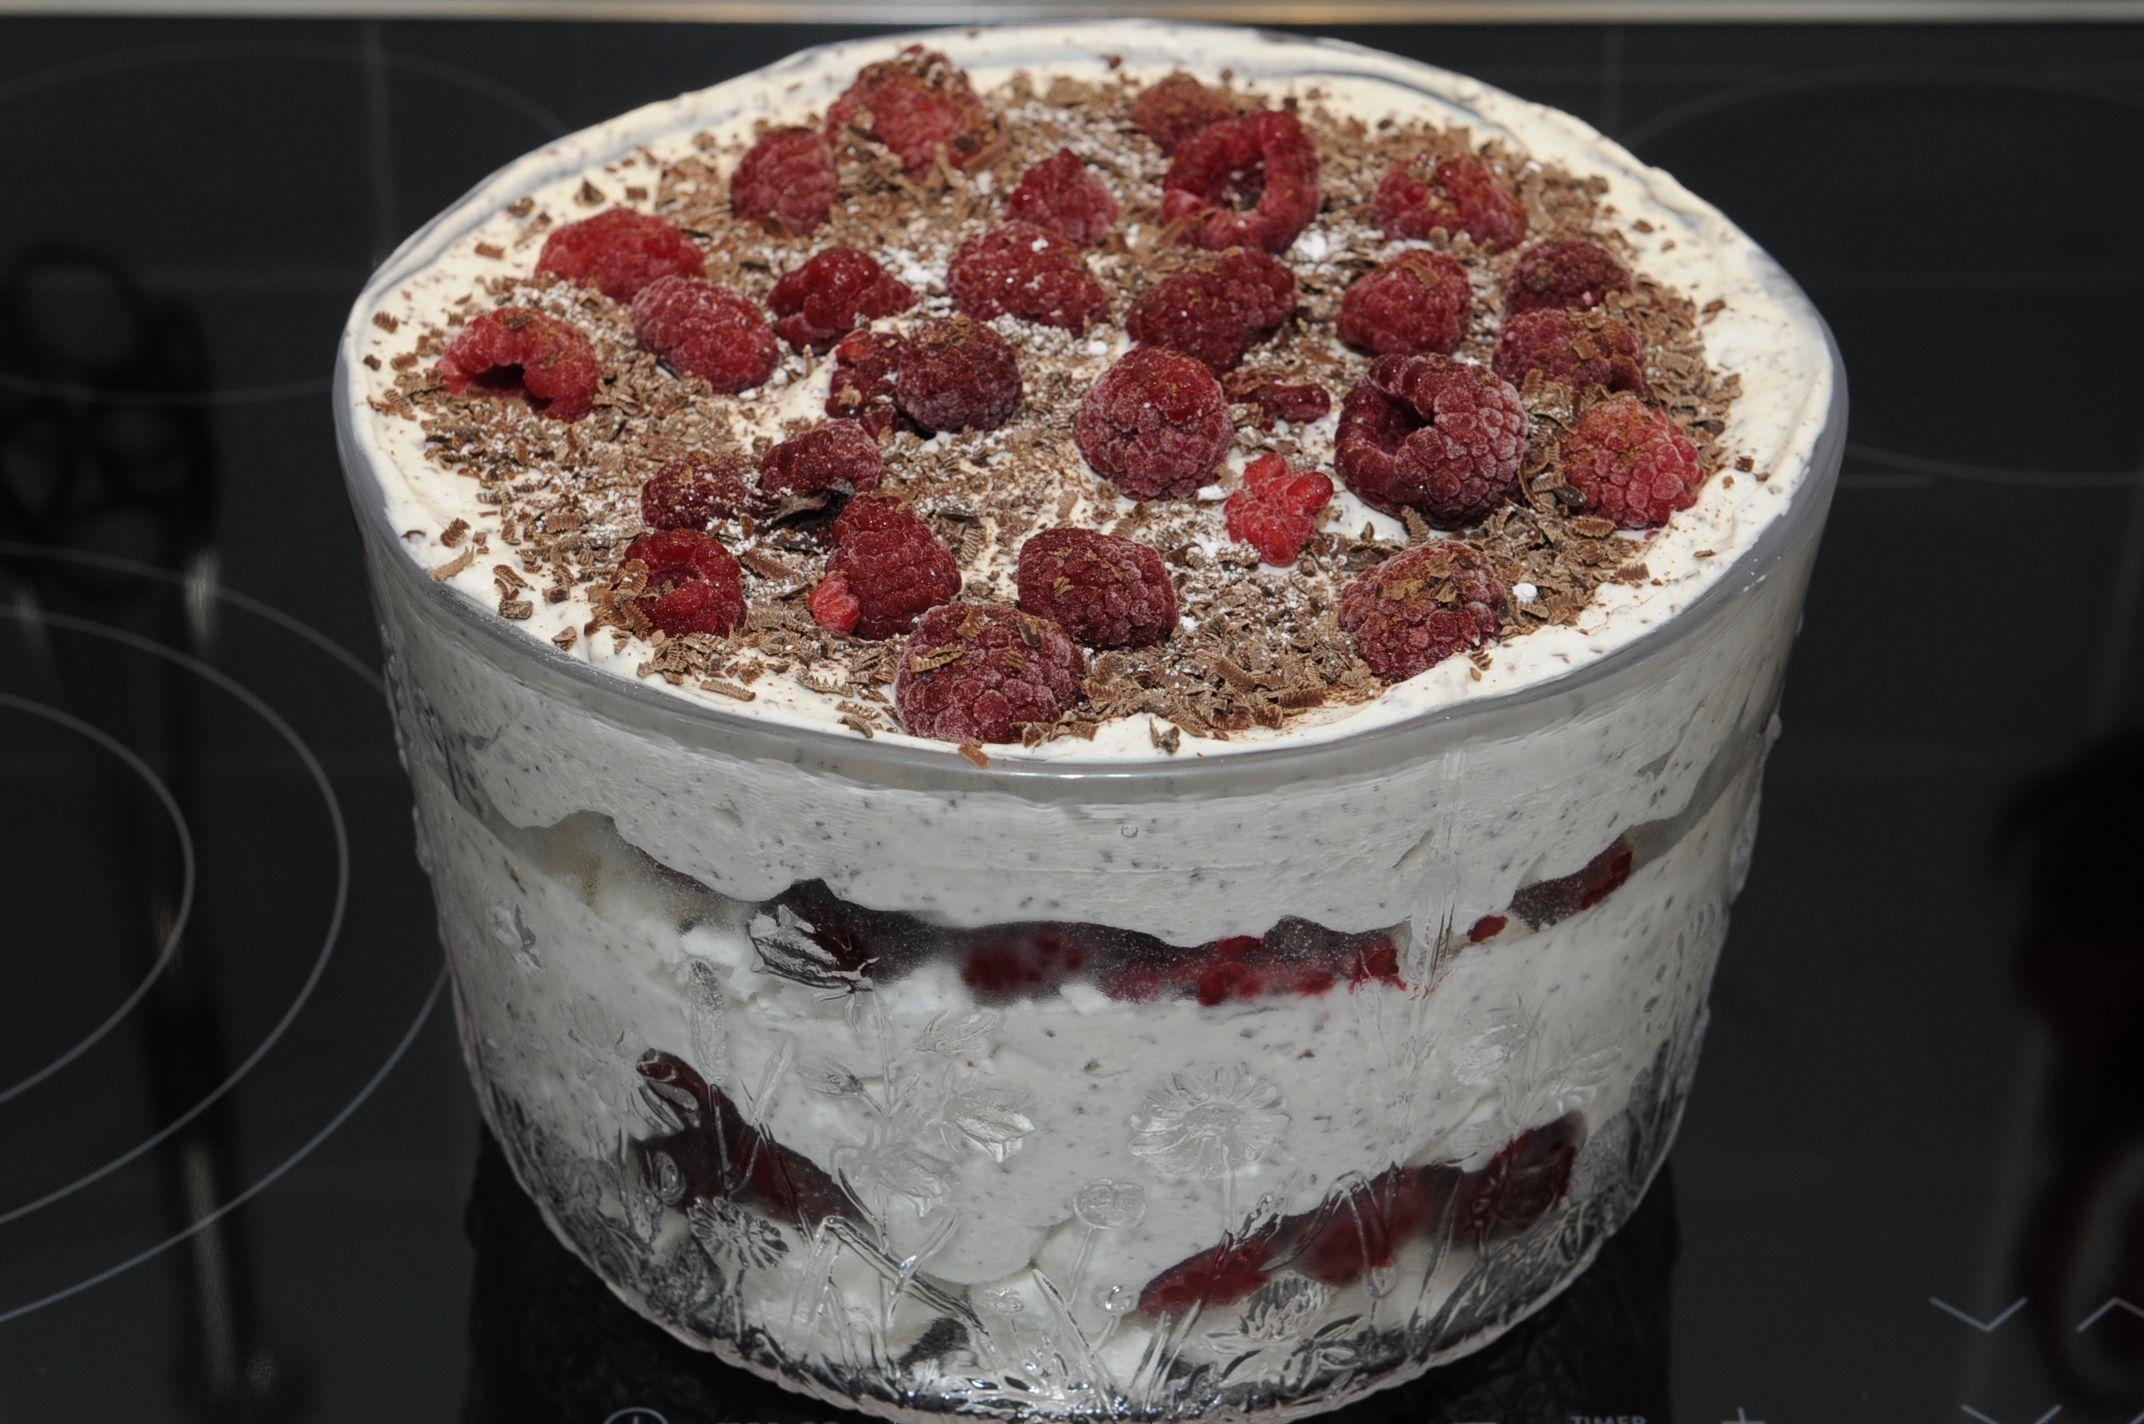 Baiser-Himbeer-Schicht-Dessert